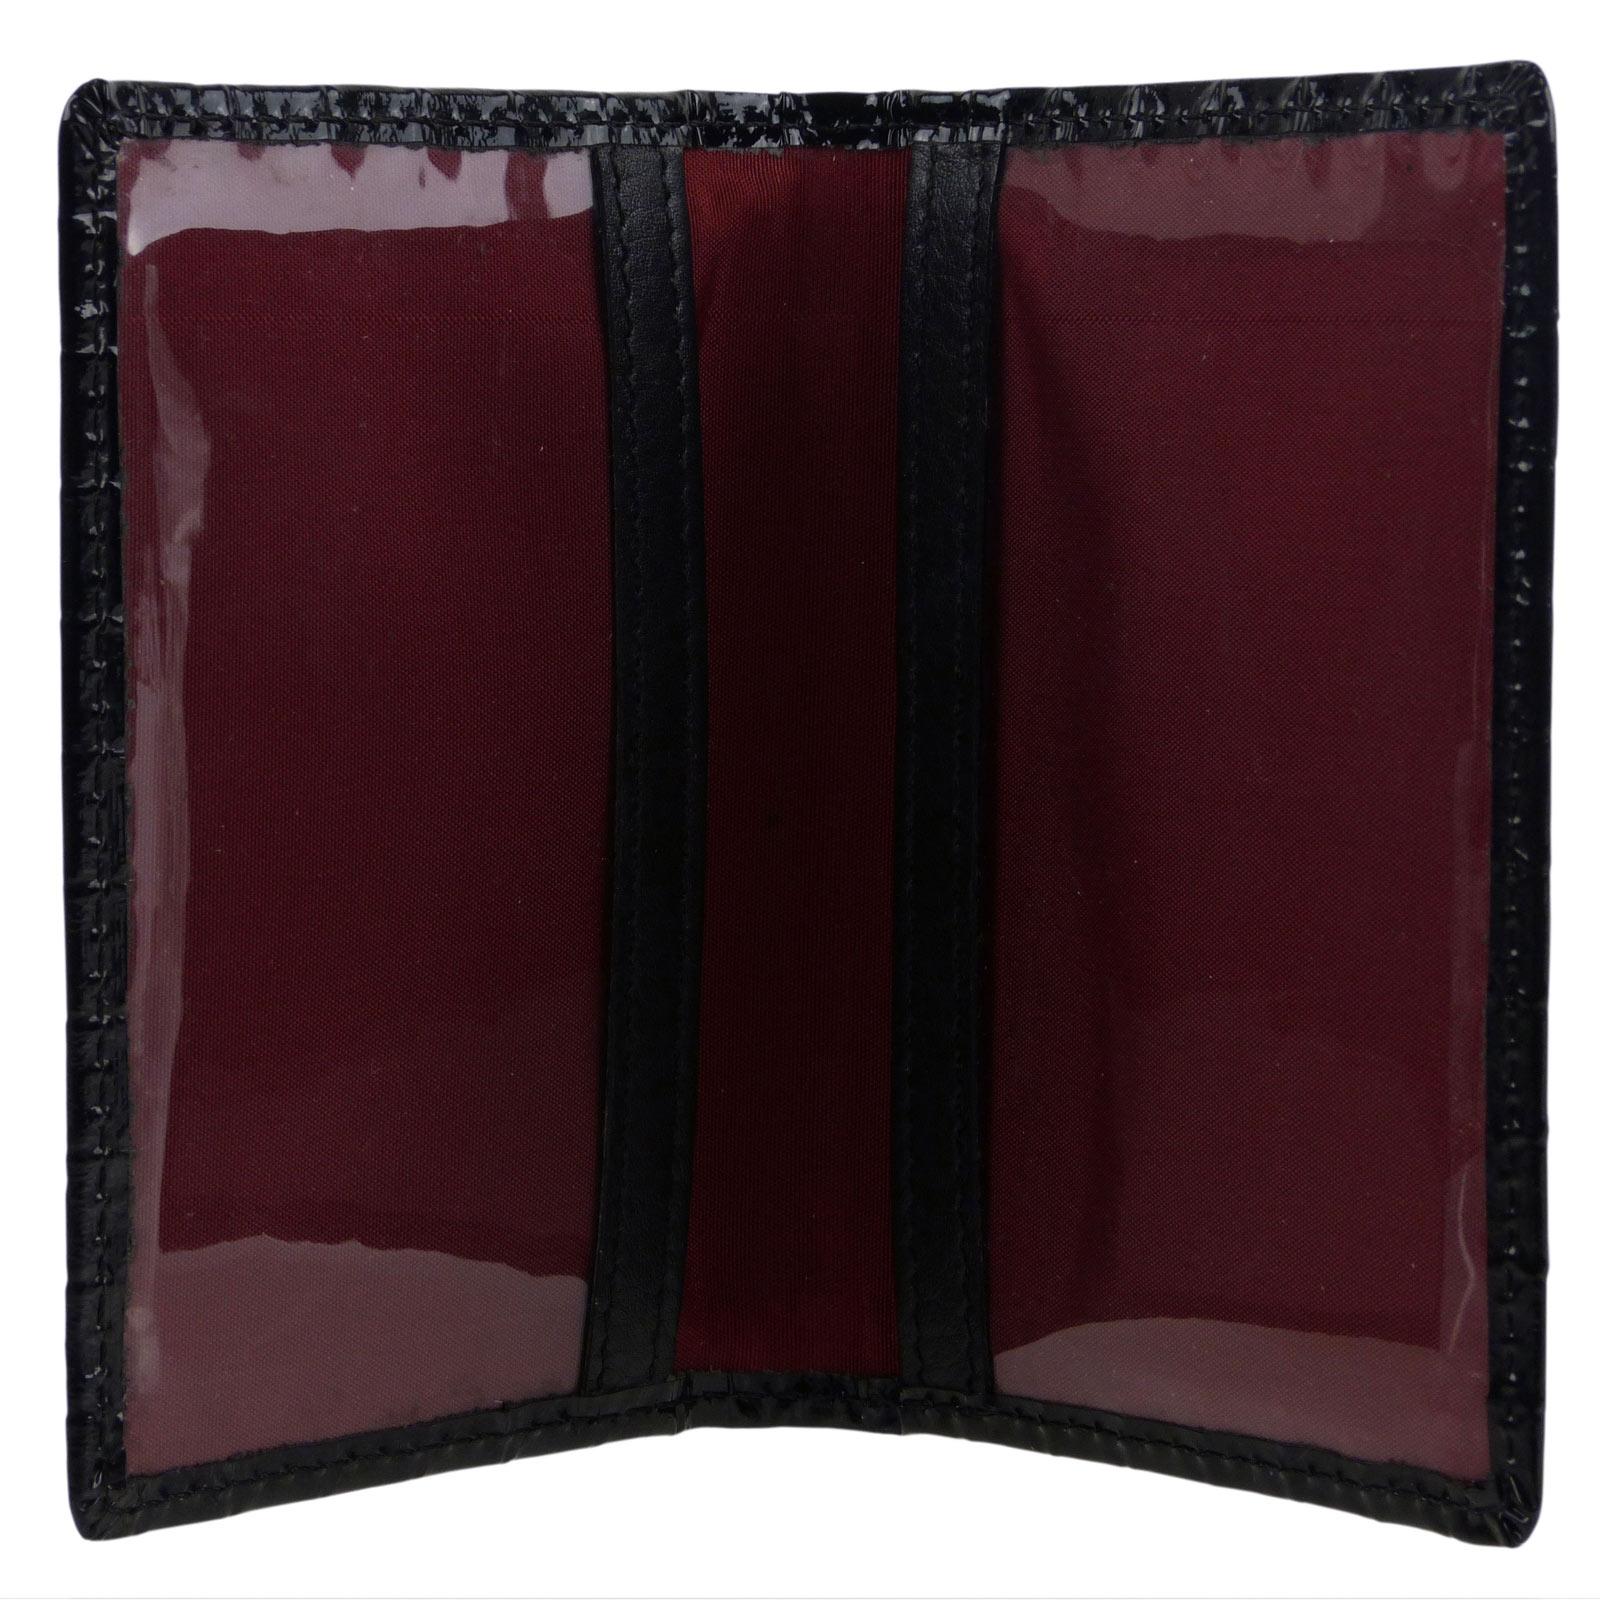 Top QUALITY Stivali in Pelle Borsa Wallet grandi Tri Fold Rosso Top Brand GOLUNSKI